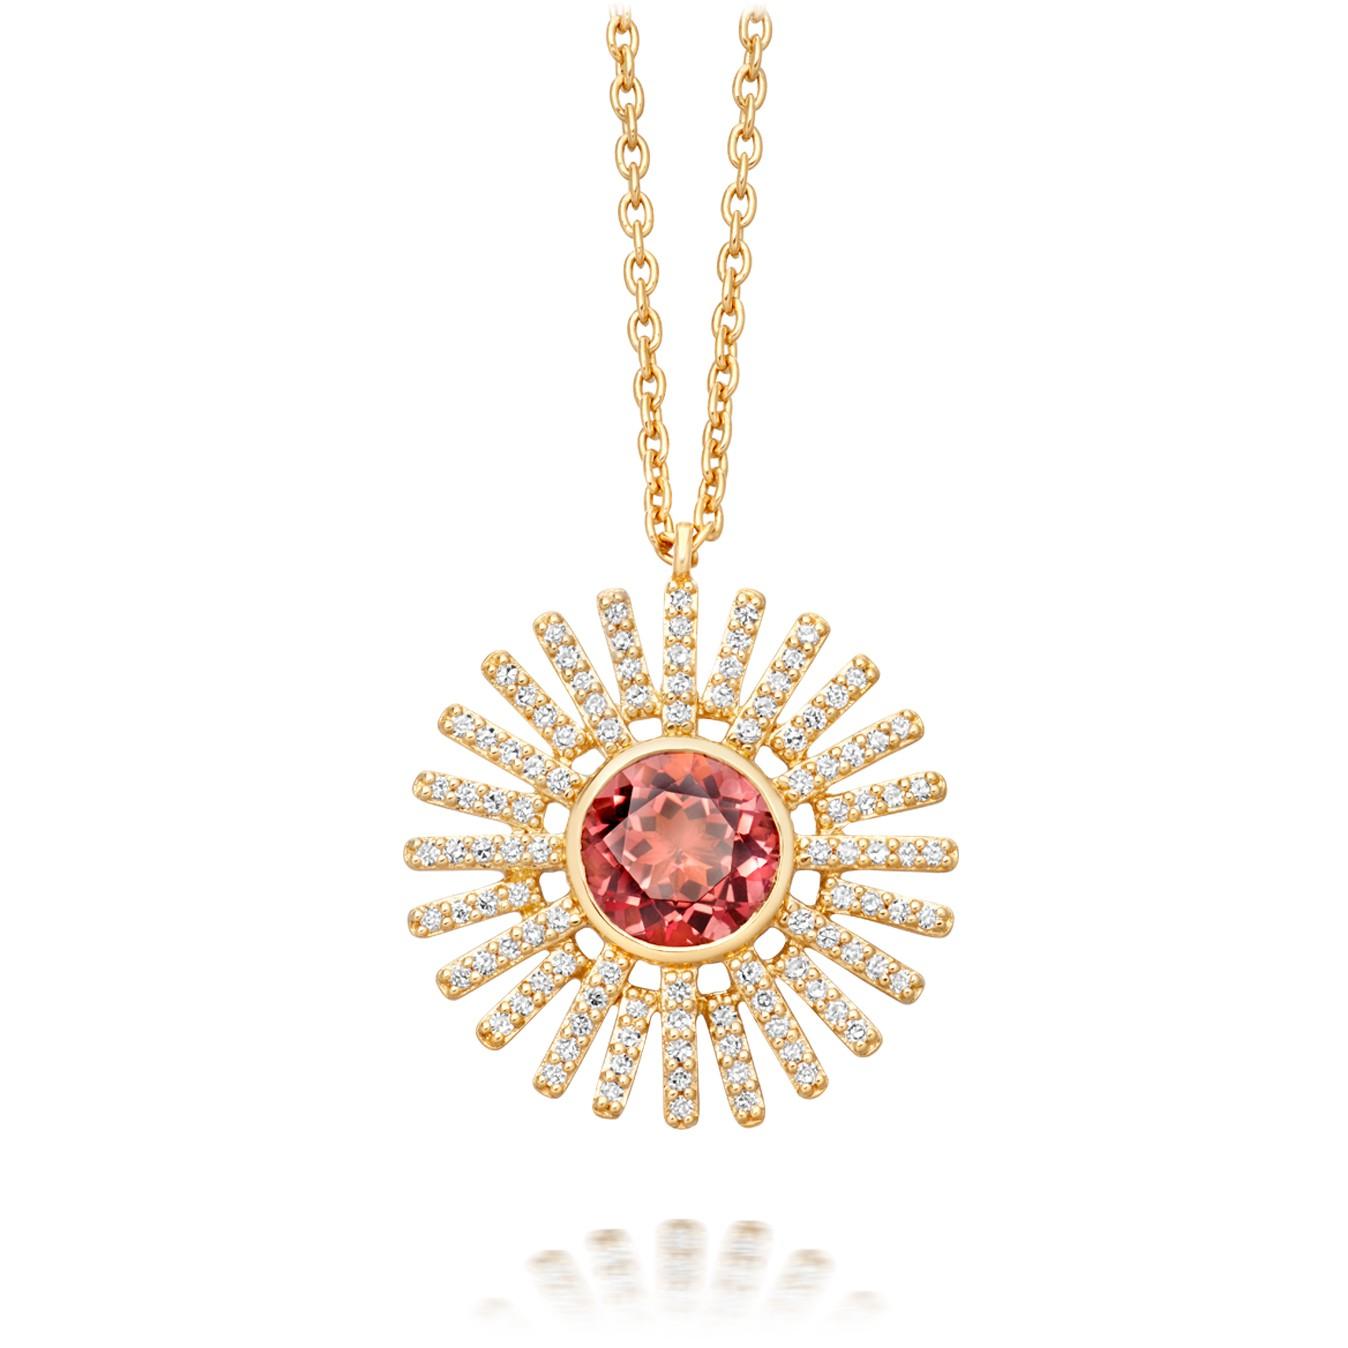 Astley Clarke Pink Tourmaline Rising Sun Pendant - British luxury jewellery - UK style blog